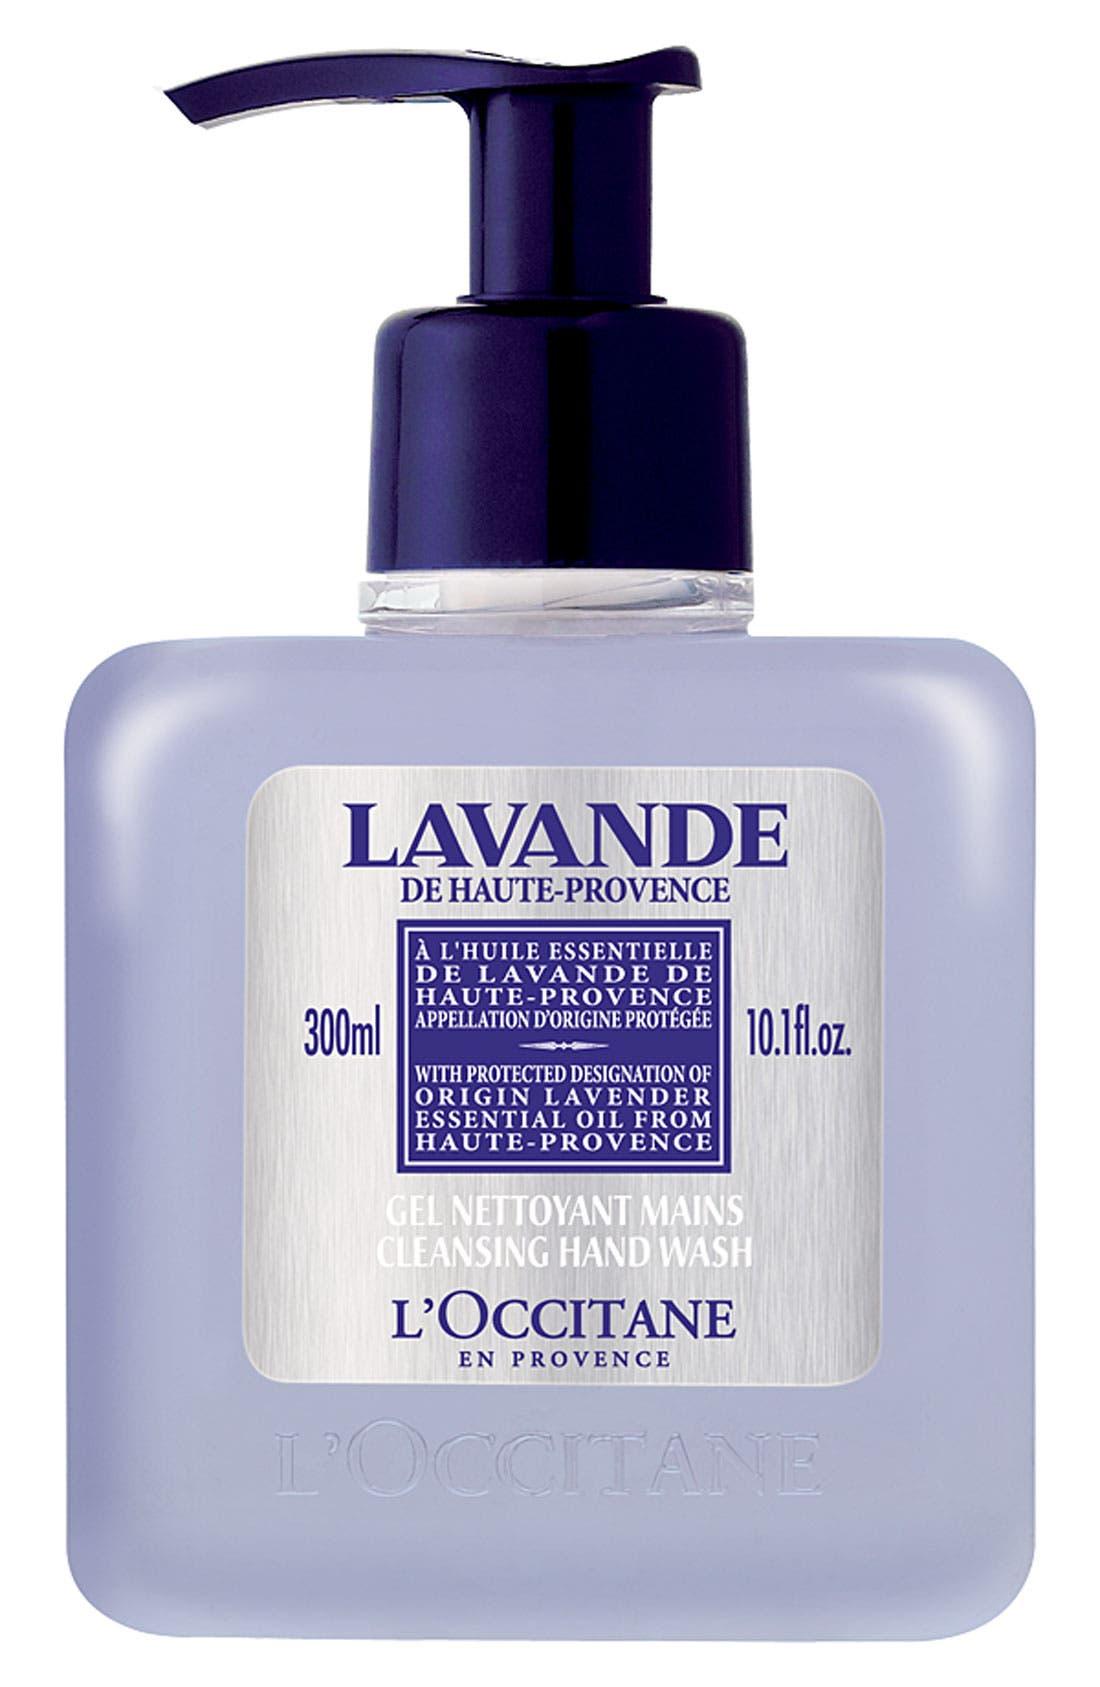 L'Occitane Lavender Cleansing Hand Wash